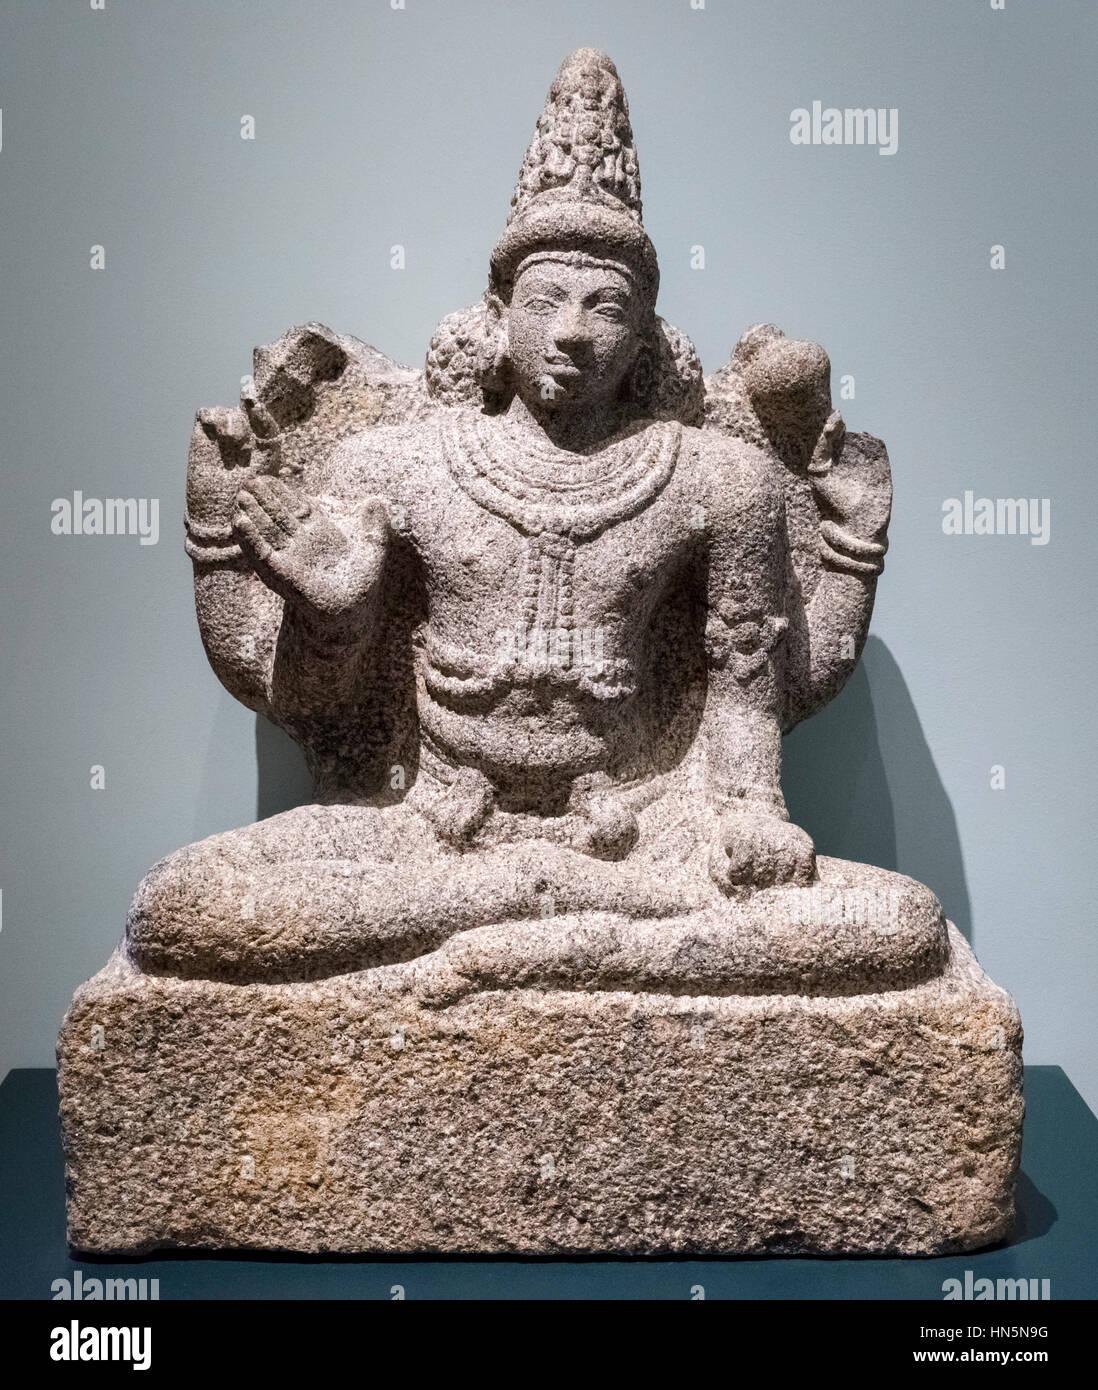 Vishnu Seated in Meditation as the Great Preserver, c.800 AD. Granite statue of the Hindu deity, Vishnu. - Stock Image